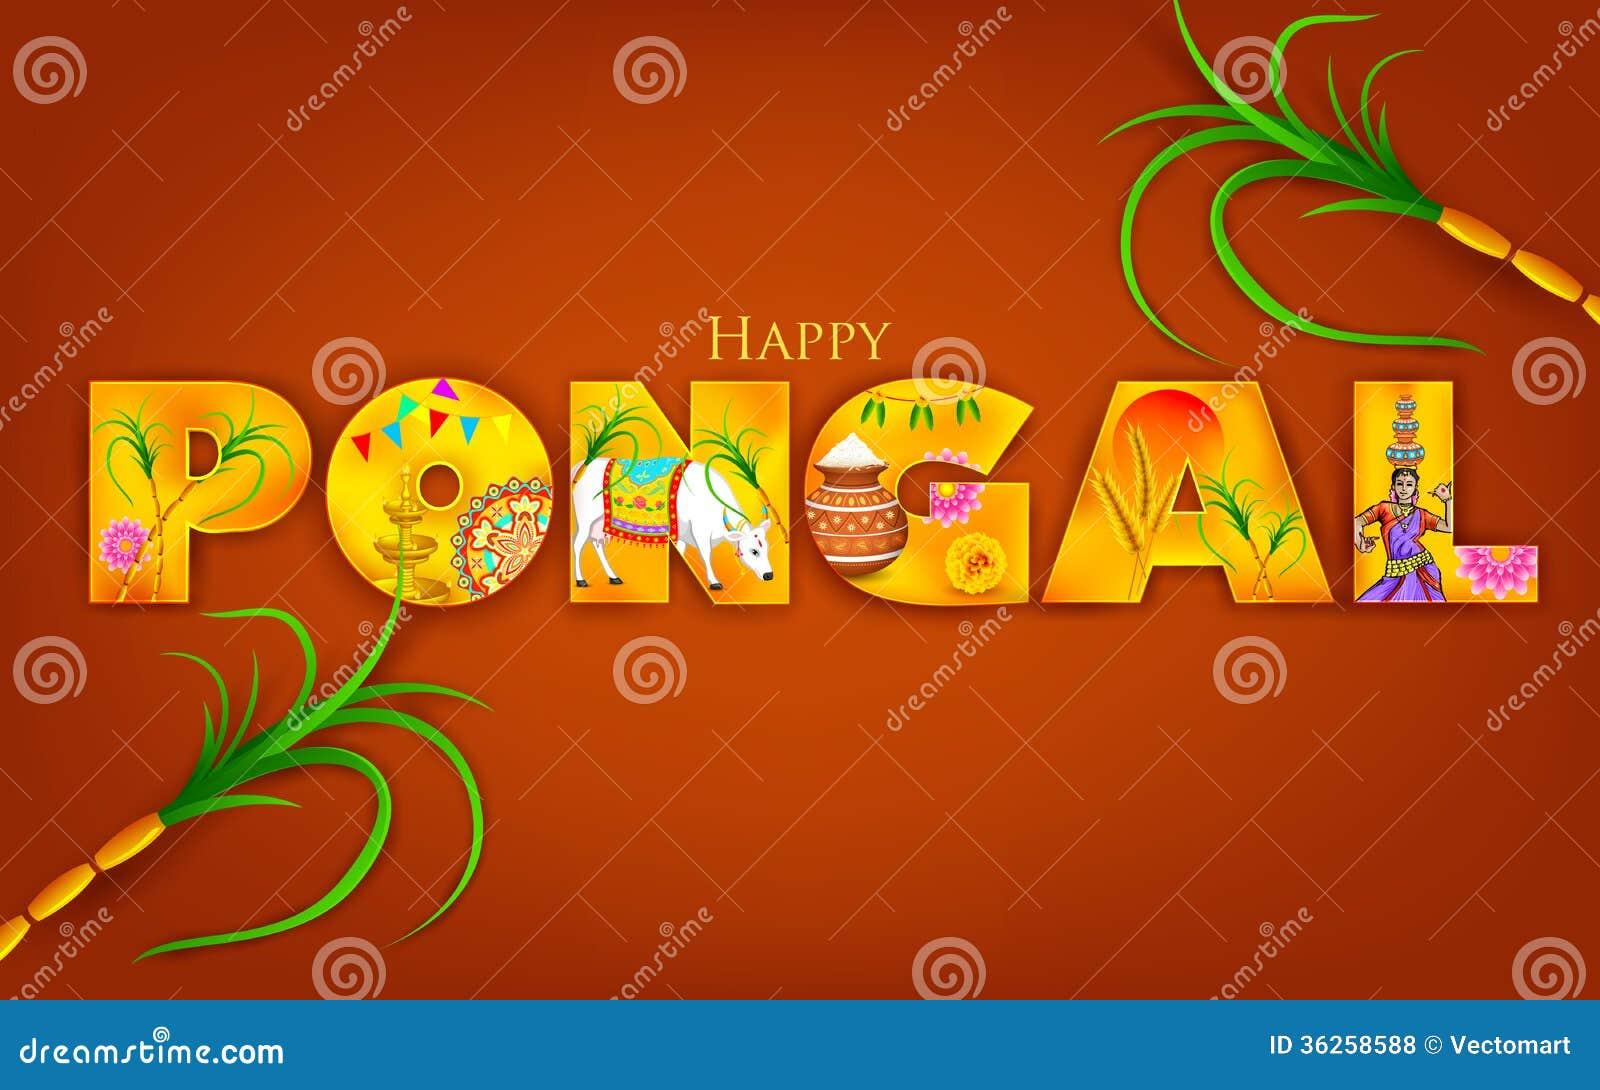 1300 x 903 jpeg 105kB, Happy Pongal Ajith Wishas Images | New Calendar ...